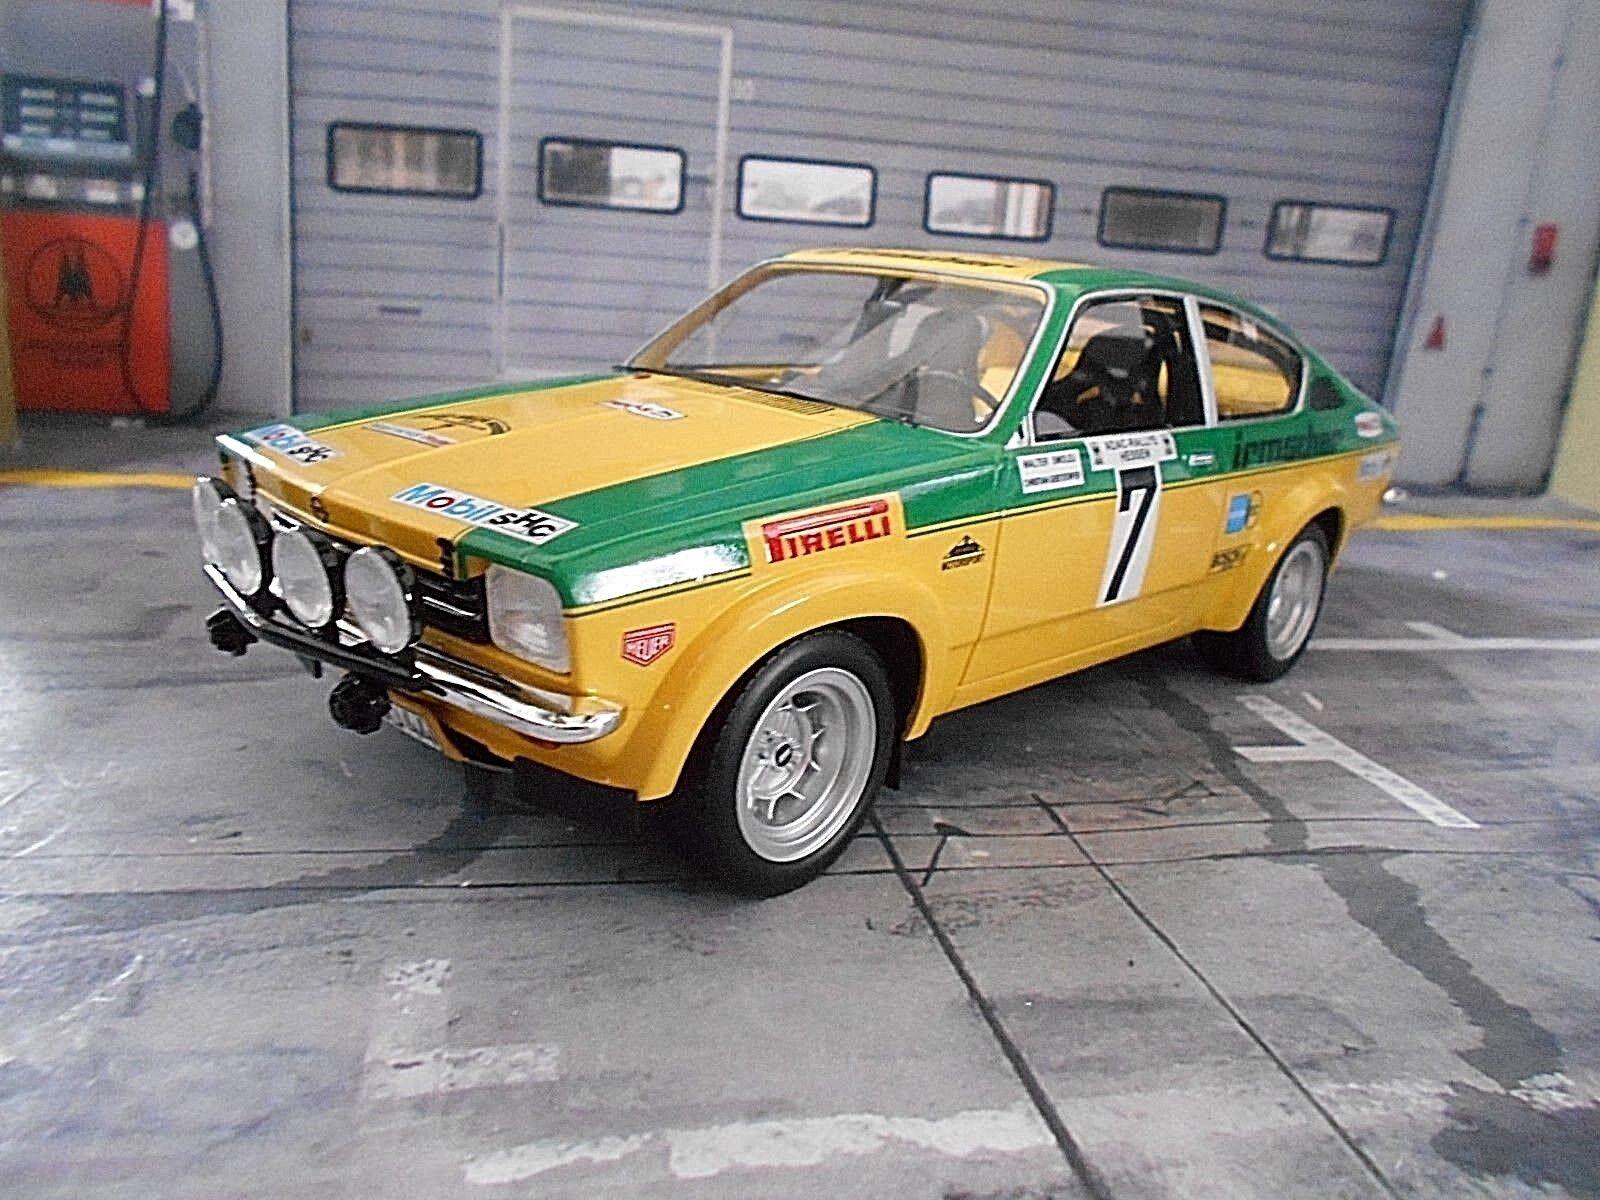 descuento C C C Opel Kadett GT E rally Hessen rally DRM 1975  7 smolej irmscher bos sp 1 18  wholesape barato